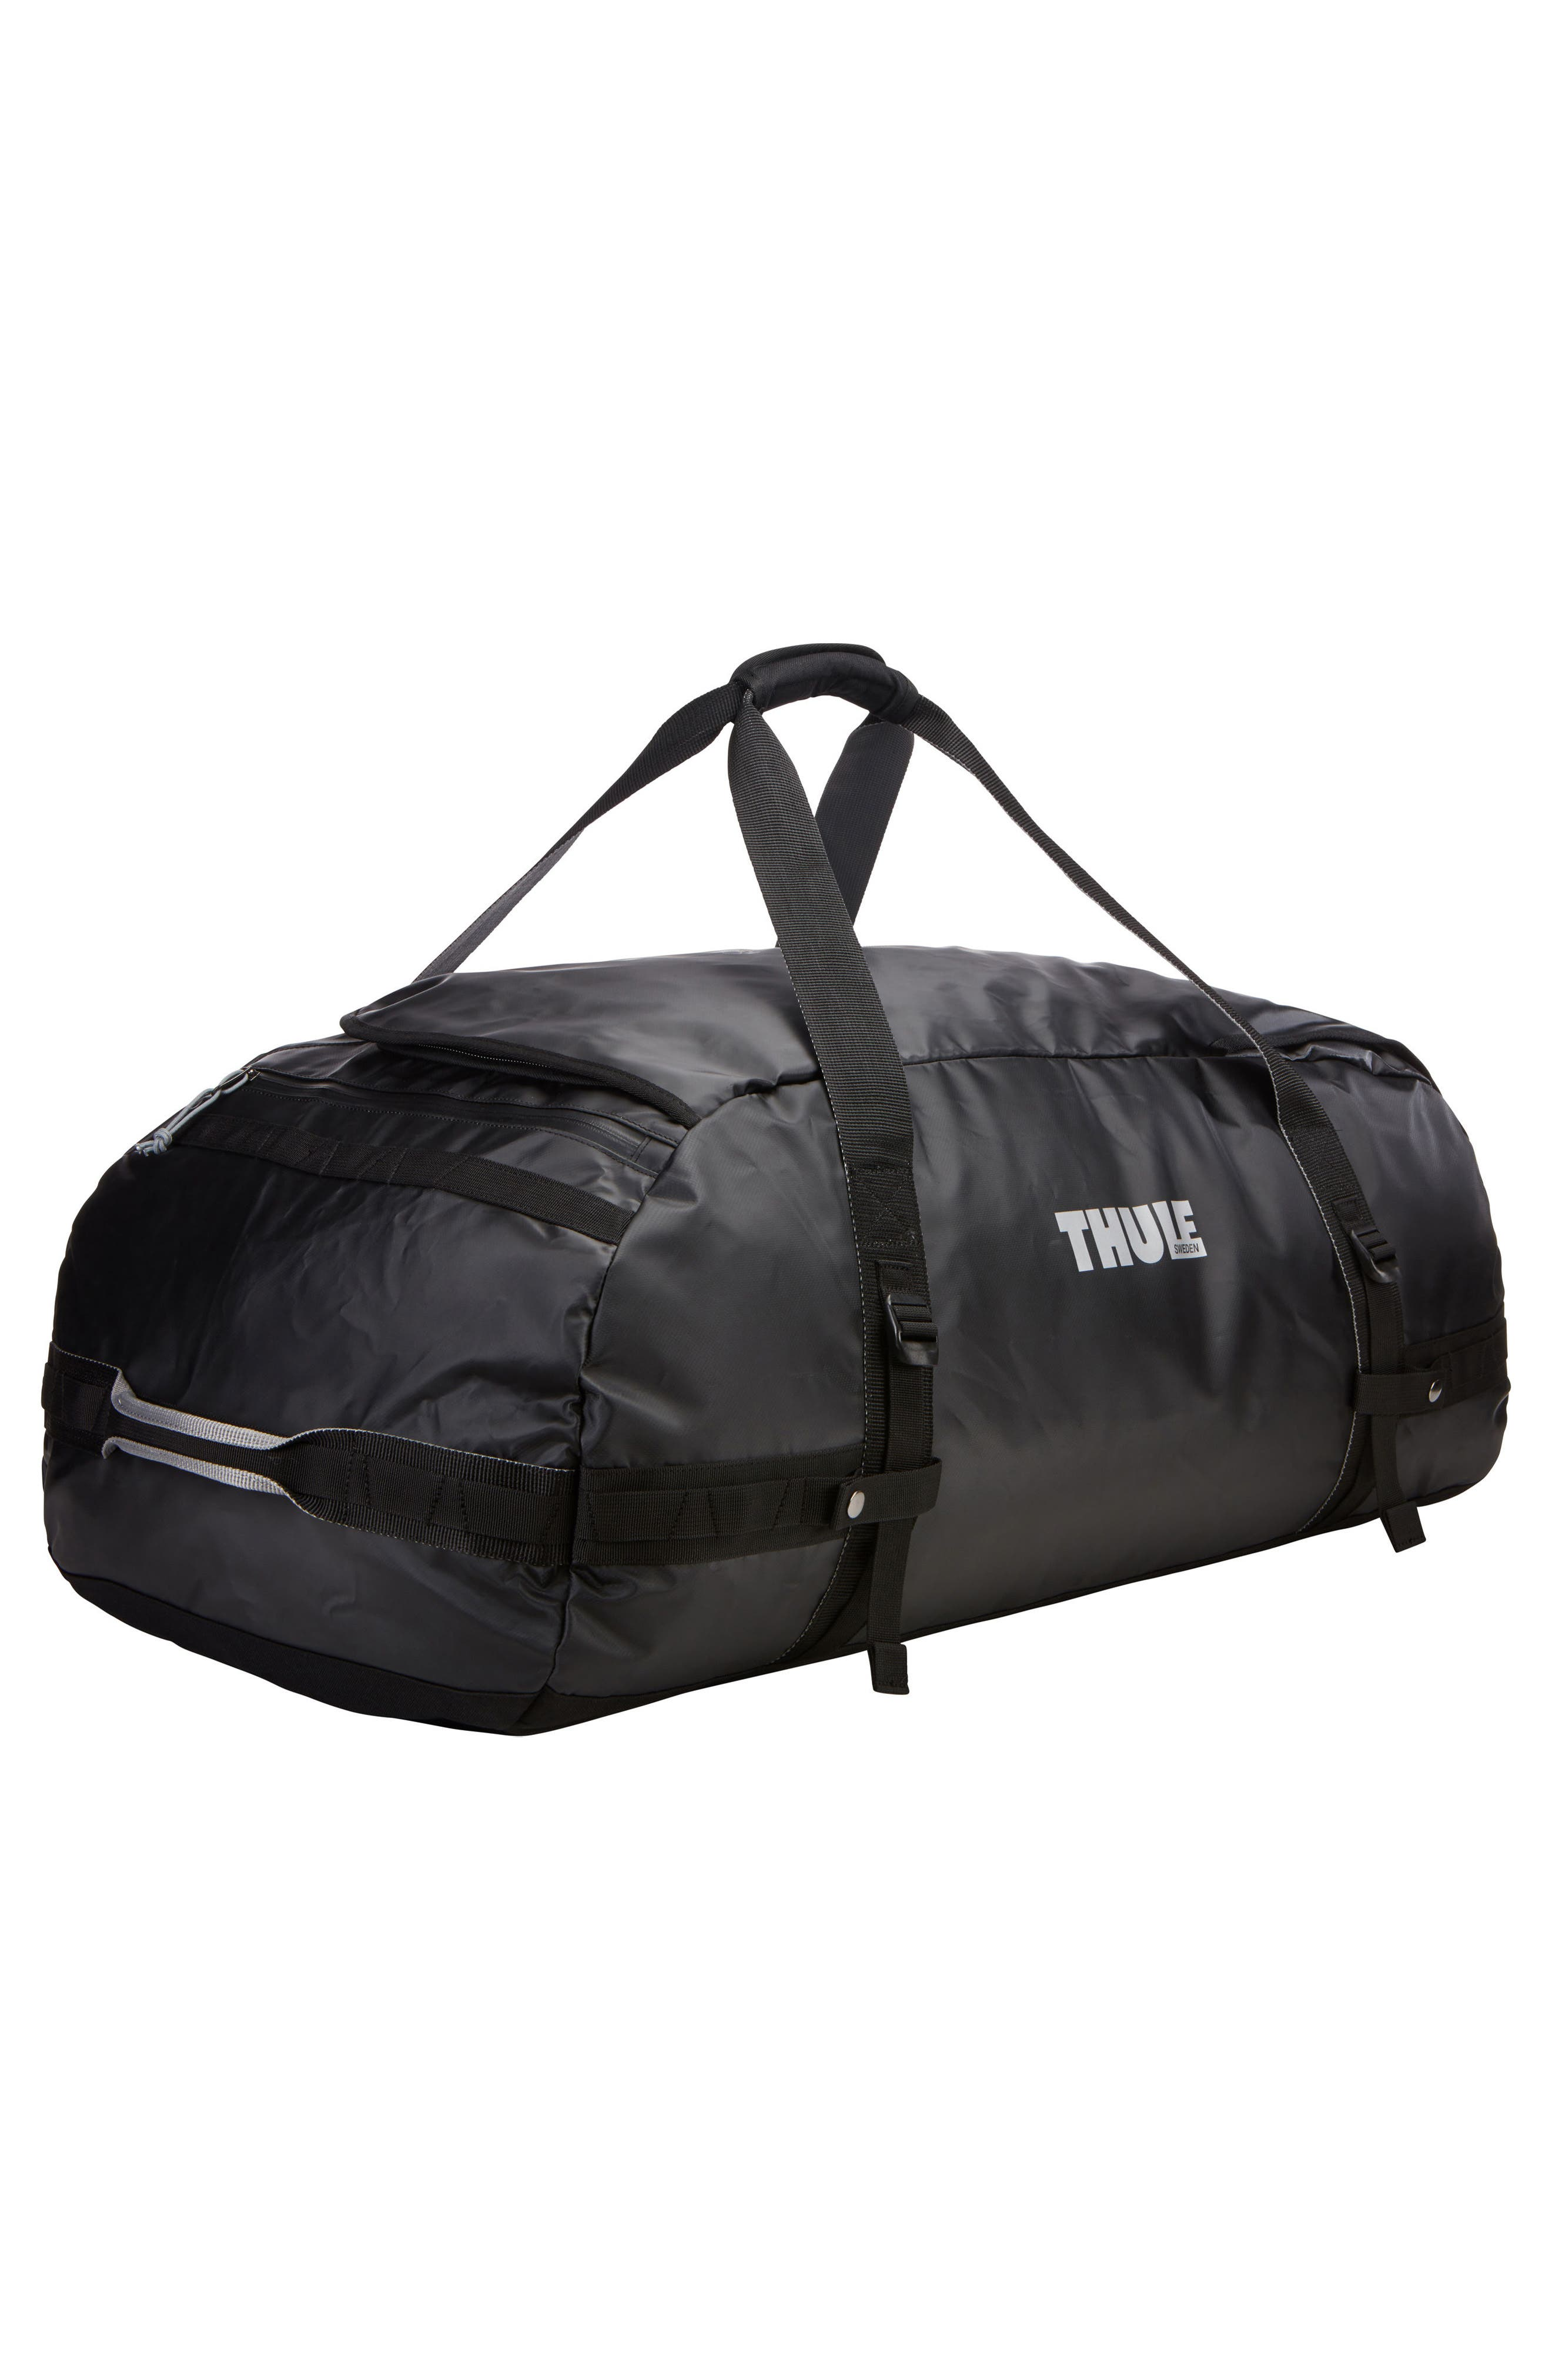 Chasm 130-Liter Convertible Duffel Bag,                             Alternate thumbnail 8, color,                             BLACK